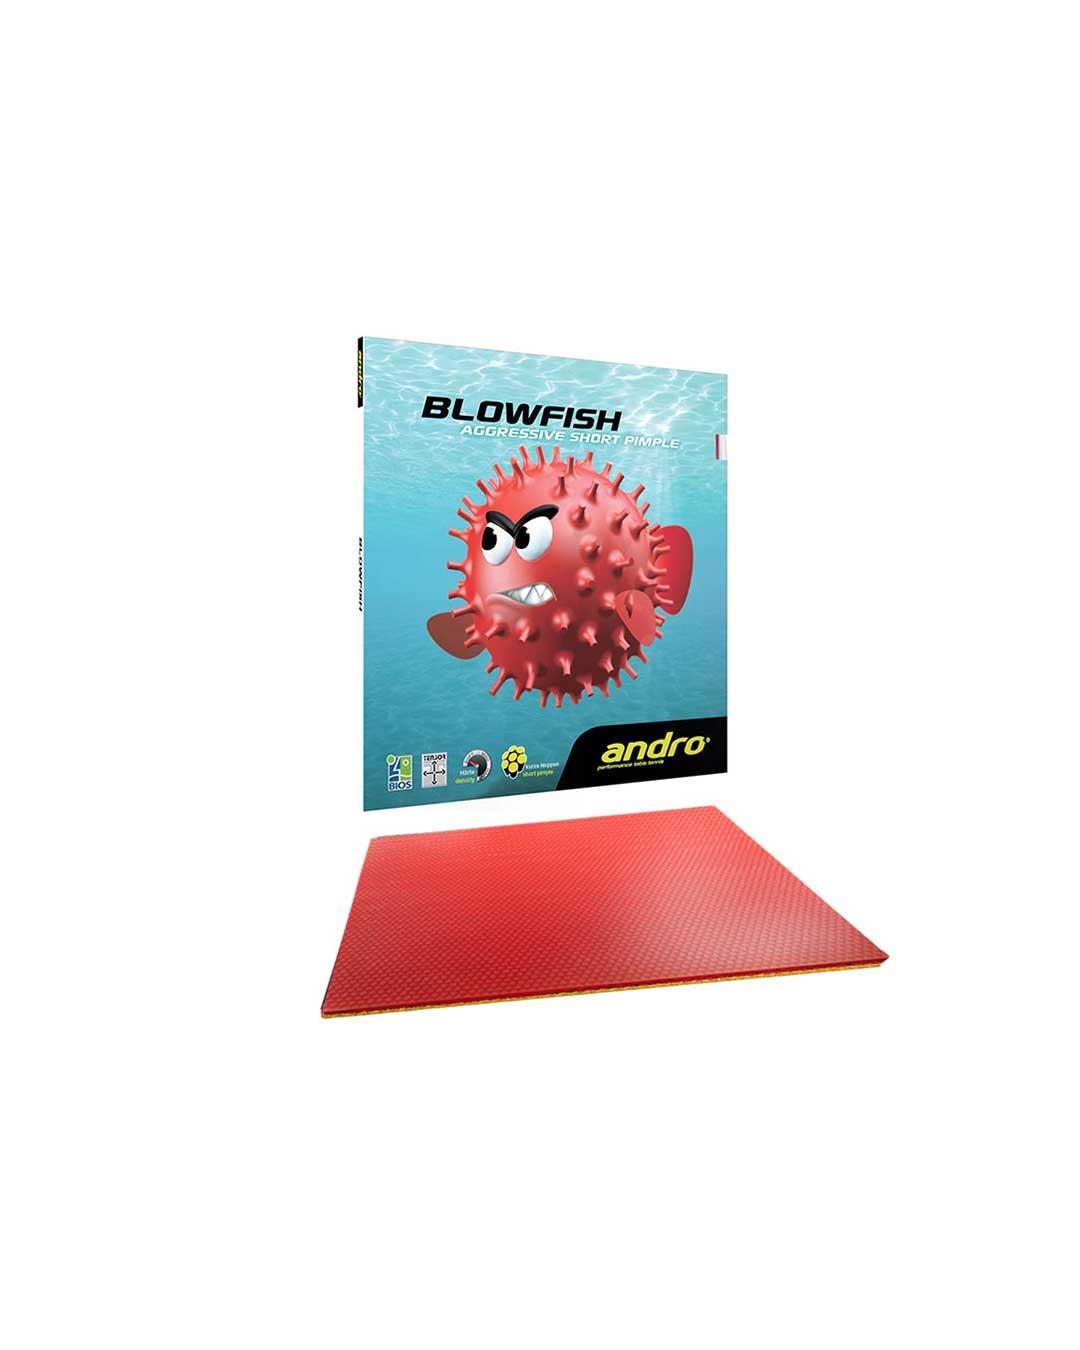 Goma Tenis de Mesa Andro Blowfish Red Max 2.2 mm